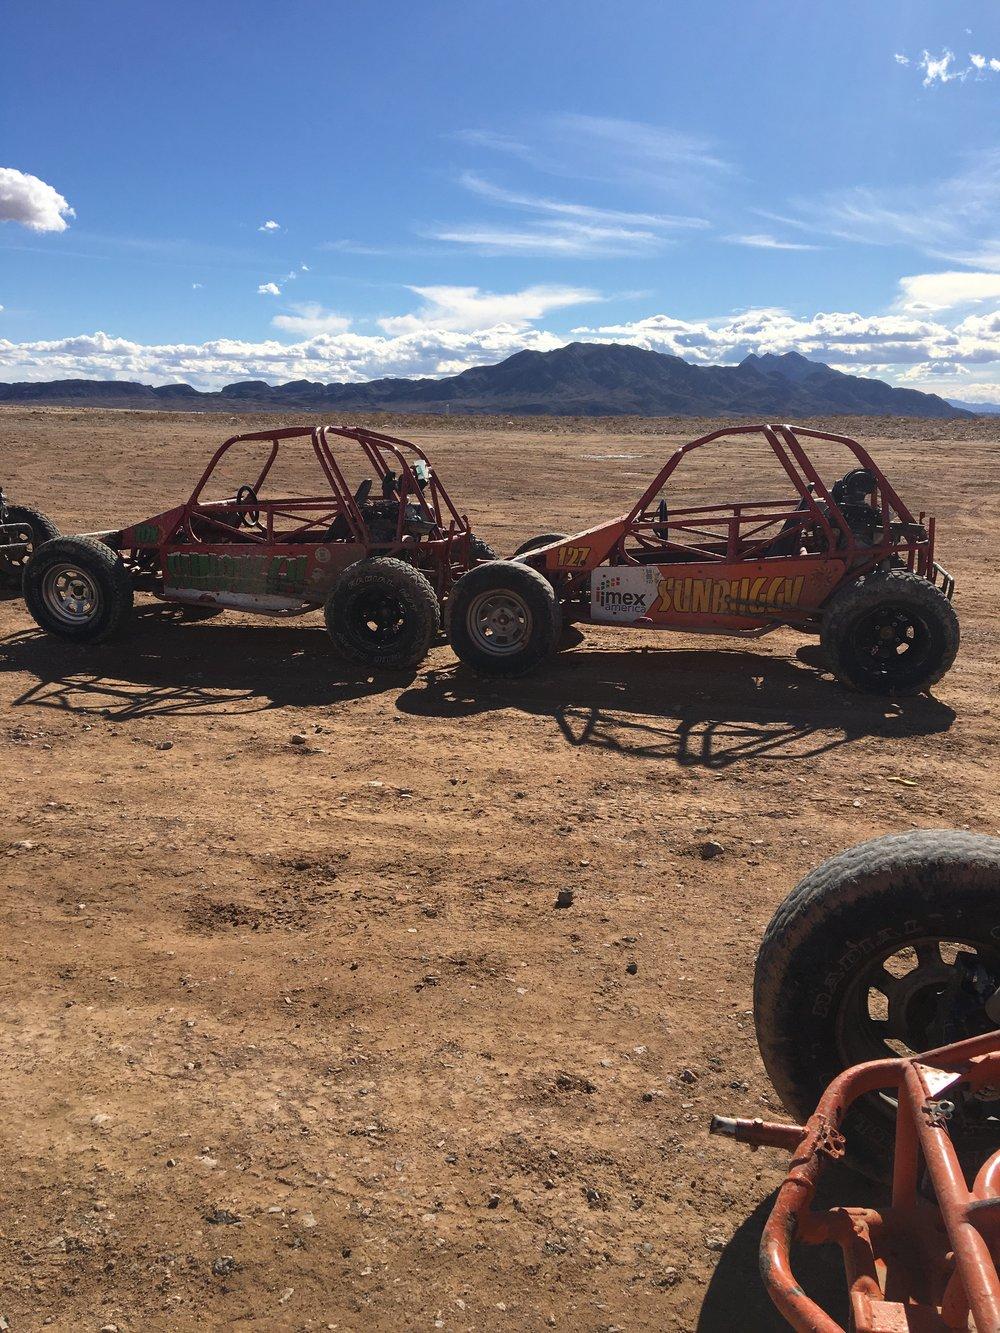 las-vegas-dune-buggy-1.jpg